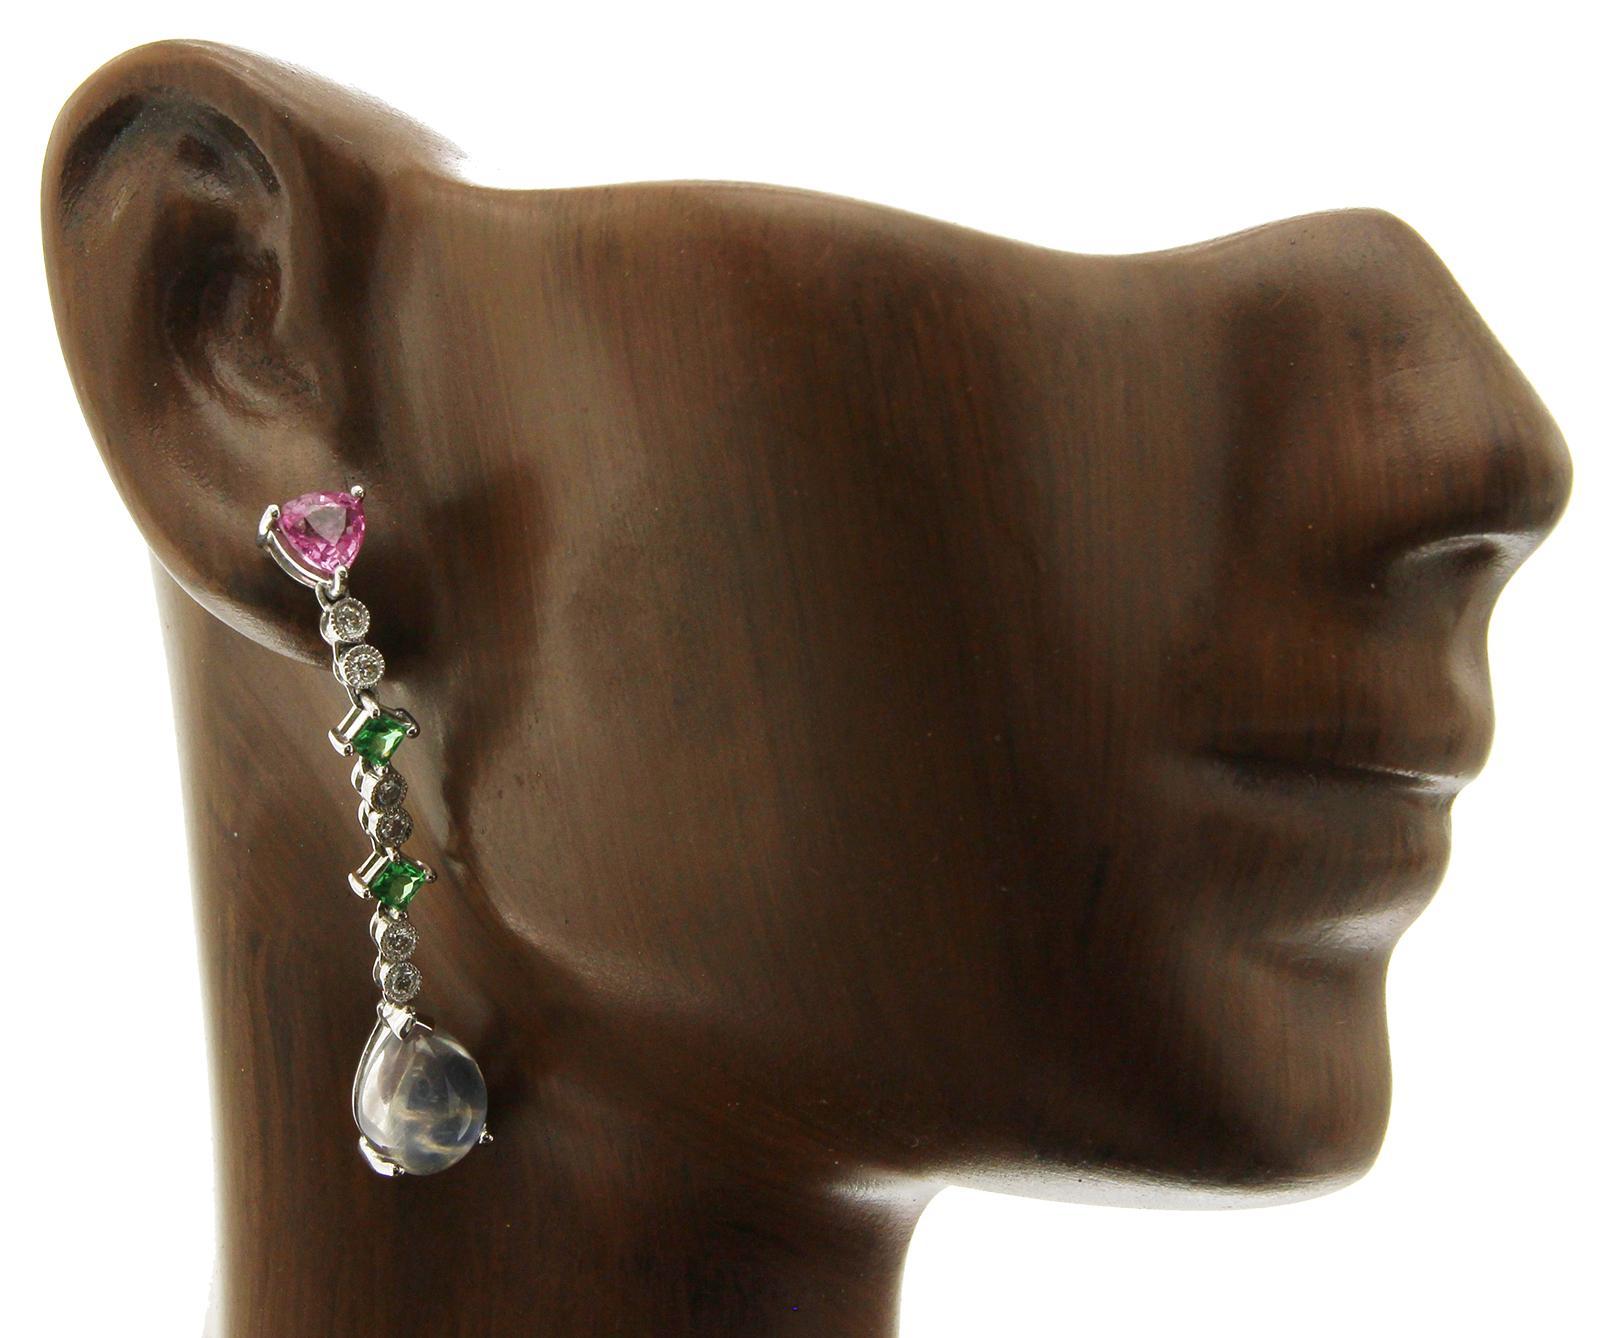 a45462f4228 18 Karat Gold 0.24 Carat Diamonds and 6.05 Carat Multi Stones Drop Earring  BL124 For Sale at 1stdibs